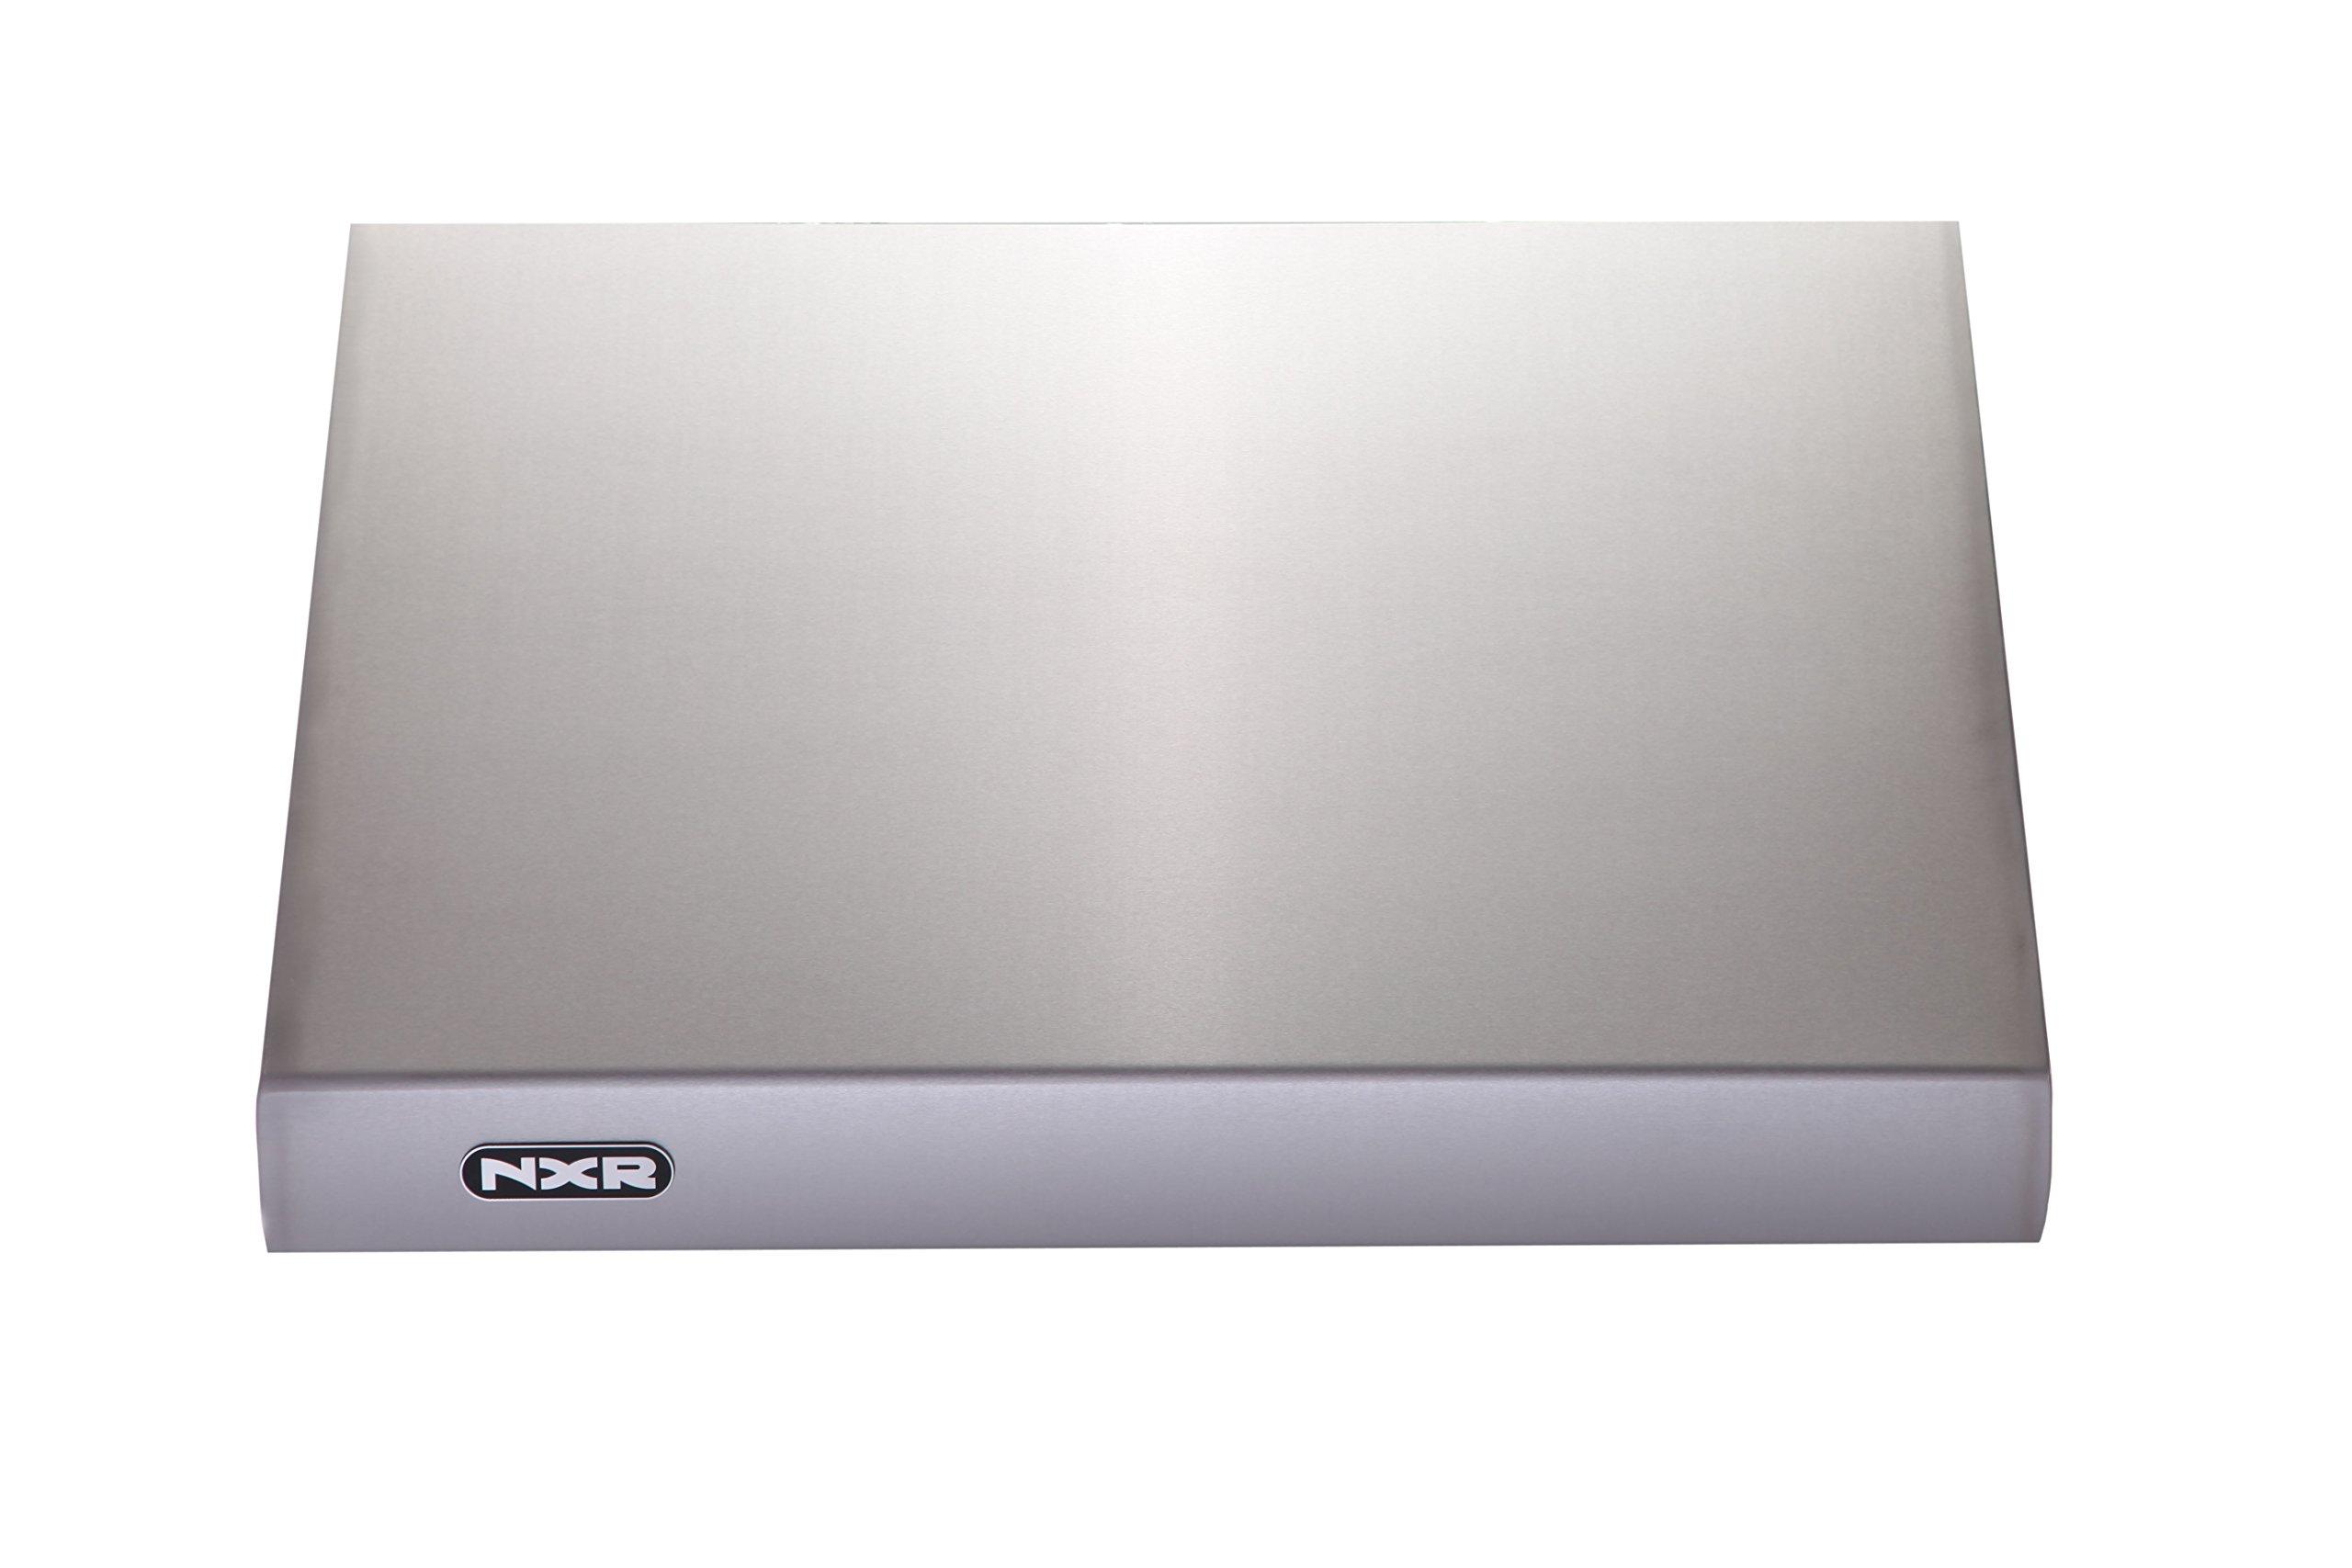 NXR NXR-RH3001 Professional Range Hood, 30'', Stainless Steel